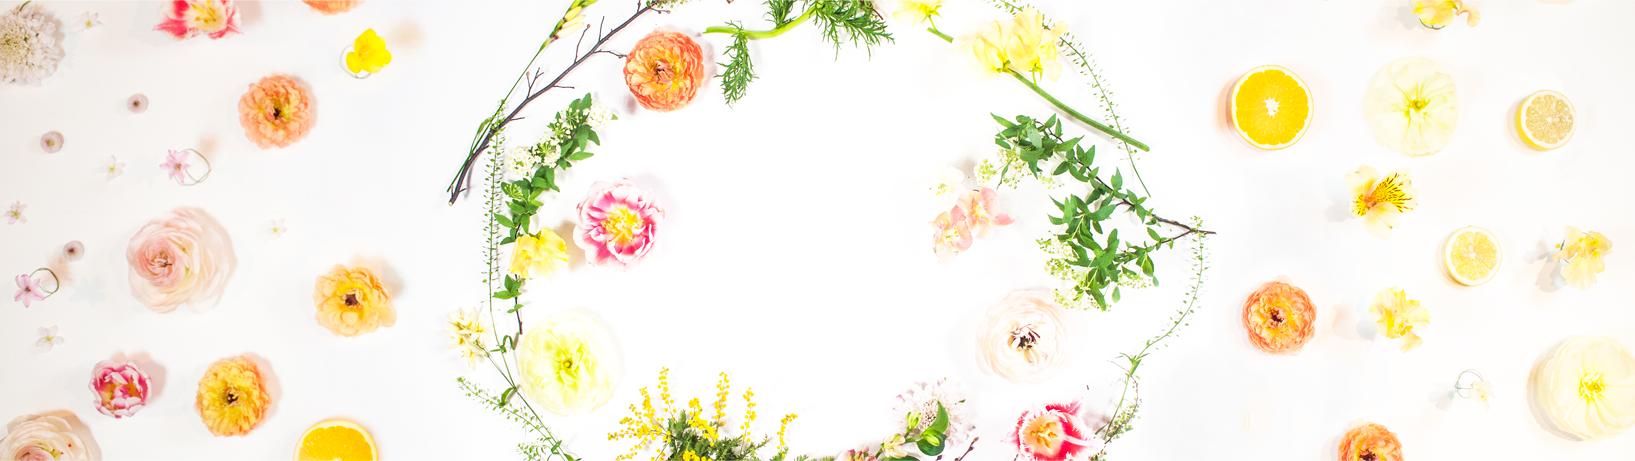 flowerarrangement-grace-daikanyama-home-slider-image_01